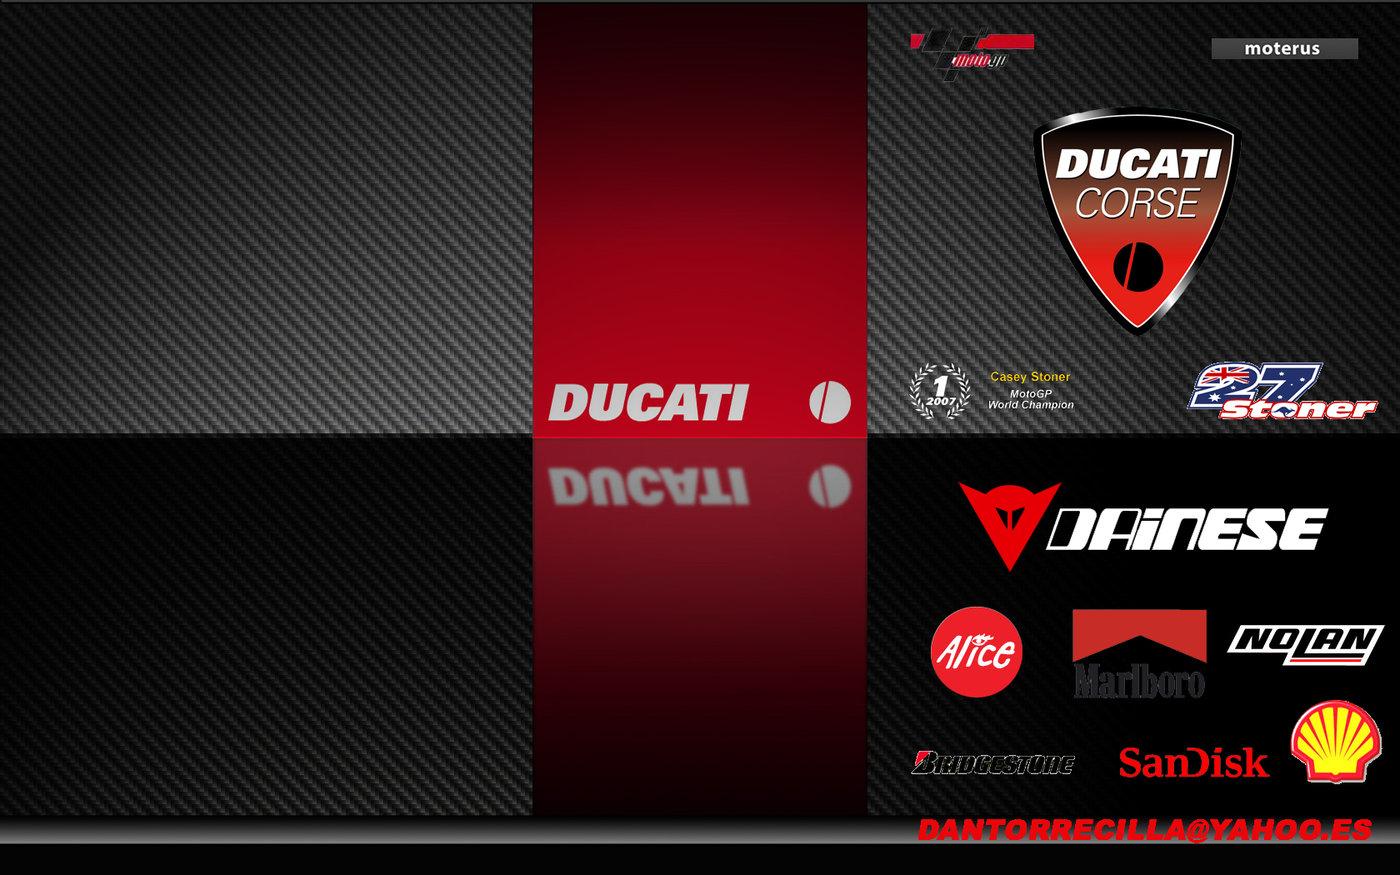 8589130586885 ducati logo wallpaper hdjpg 1400x875